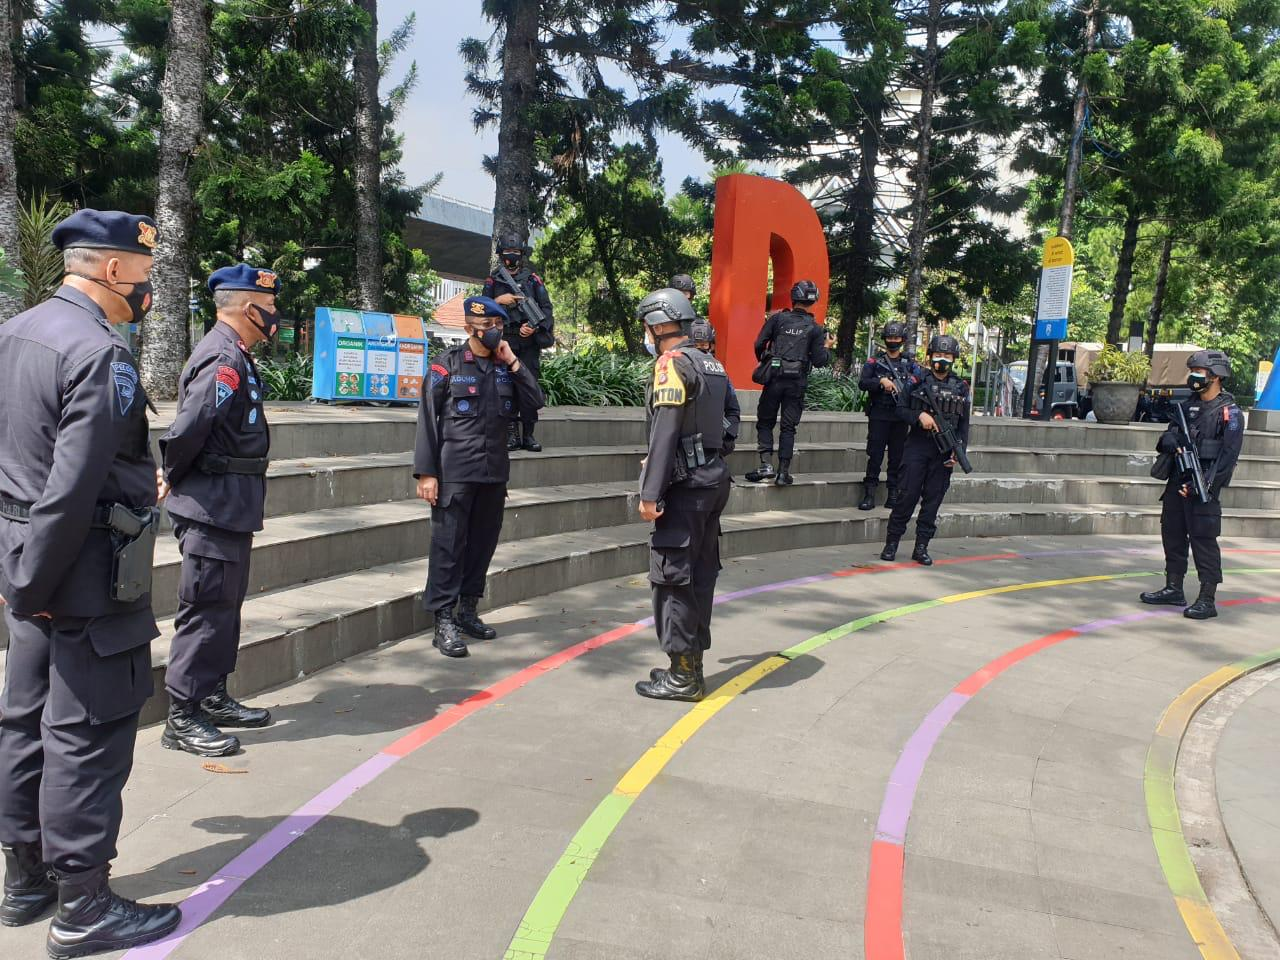 Jelang Tahun Baru, Wadansat Brimob Polda Jabar Cek Pos Pam Di Kota Bandung